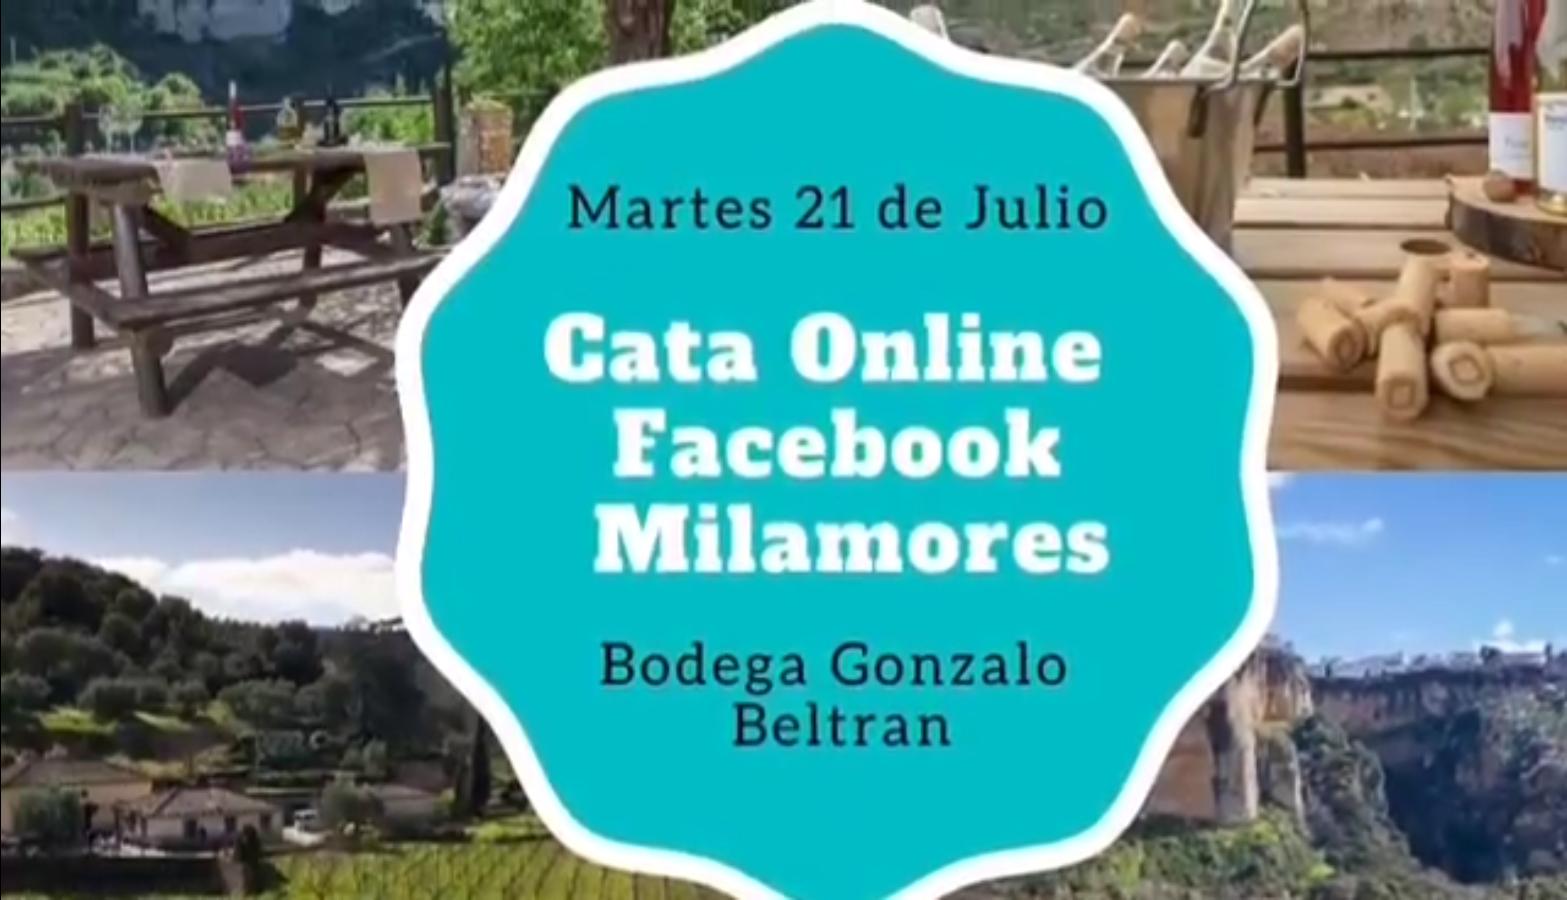 Cata de Vinos ON LINE Bodega Gonzalo Beltrán